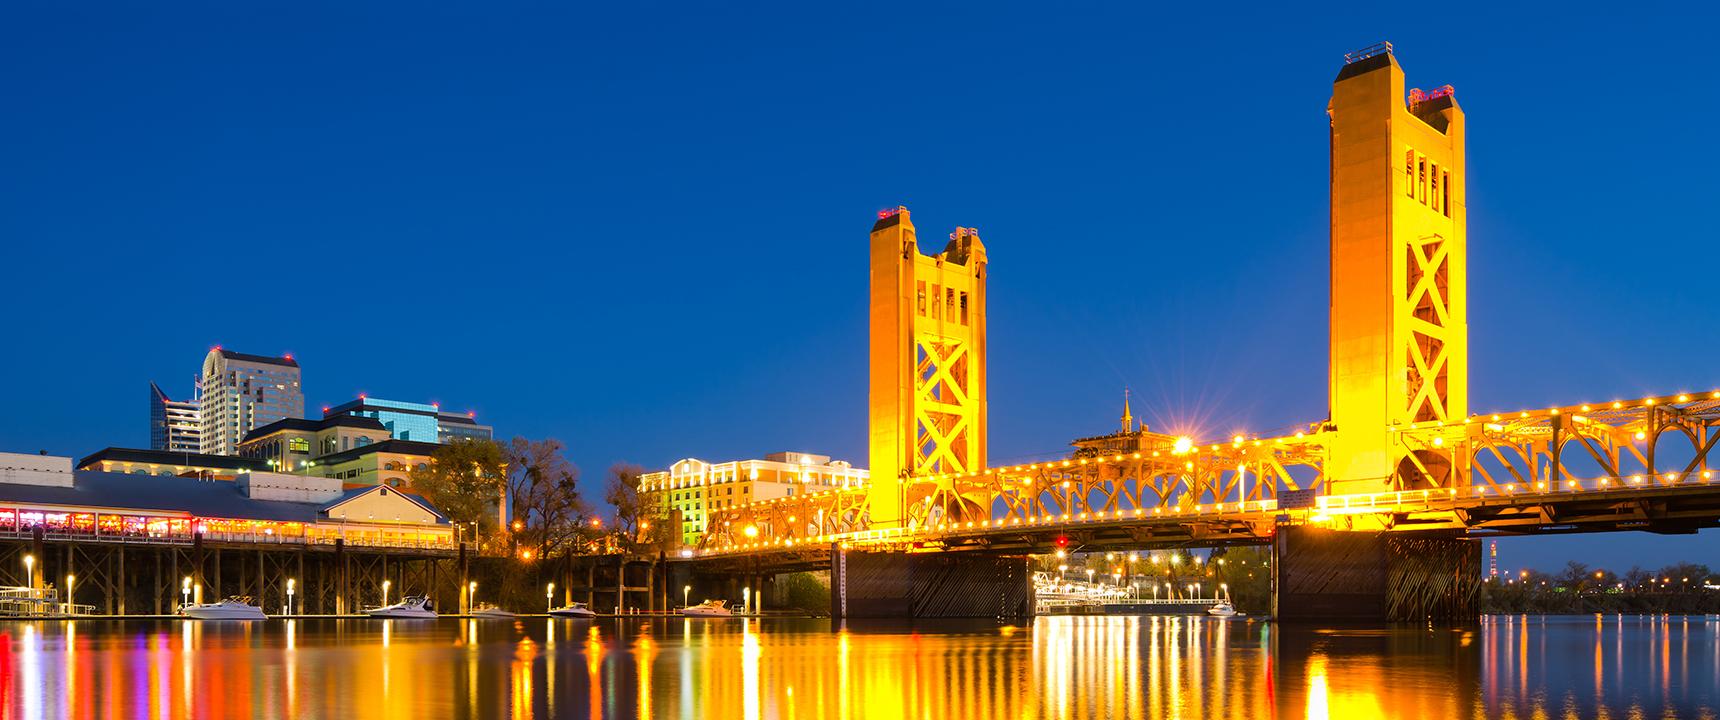 Skyline photo of Sacramento, California.